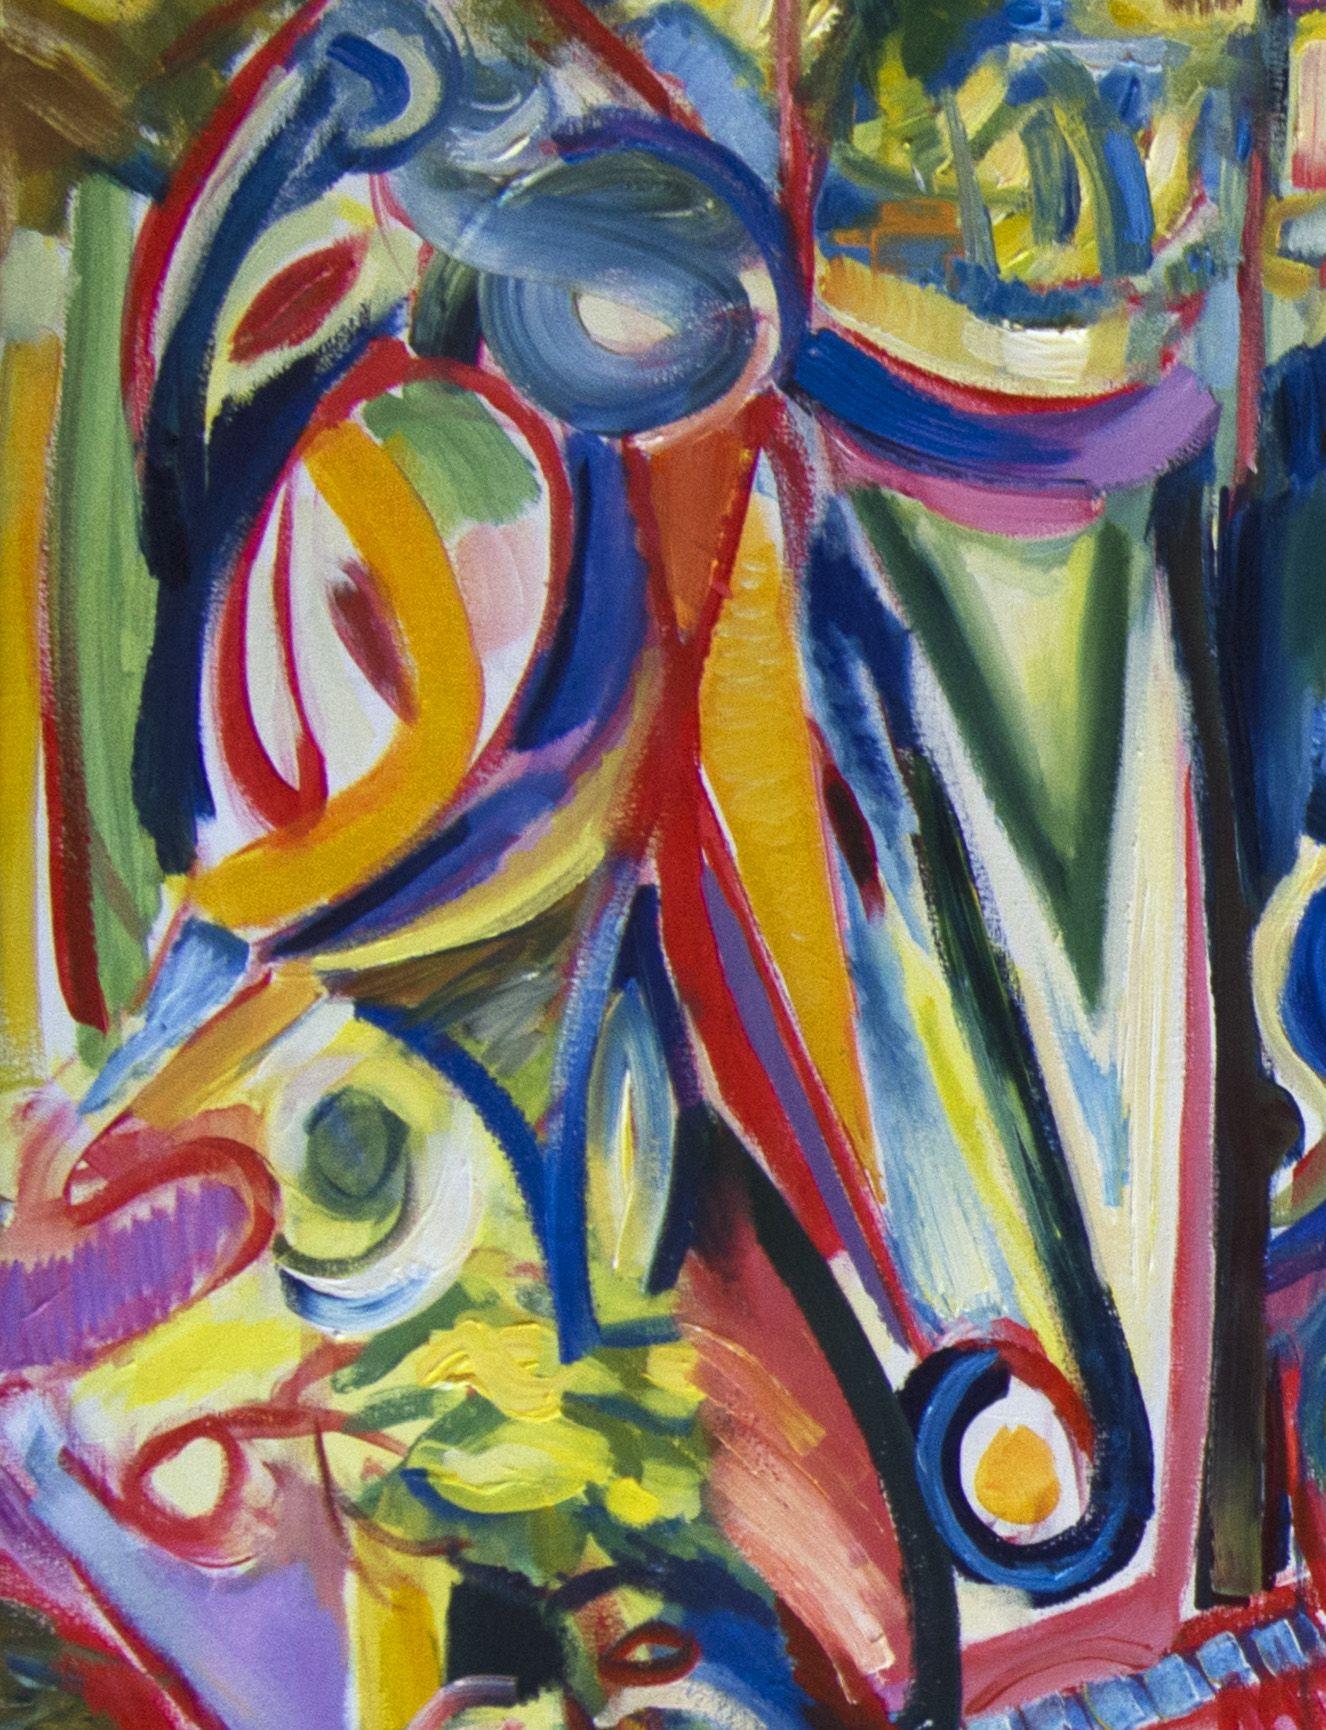 Ölgemälde Von Maciej Cieśla Zeitgenössische Kunst Zeitgenössischekunst Ölgemälde Malerei Galerie Berlin München V Zeitgenössische Kunst Kunst Malerei